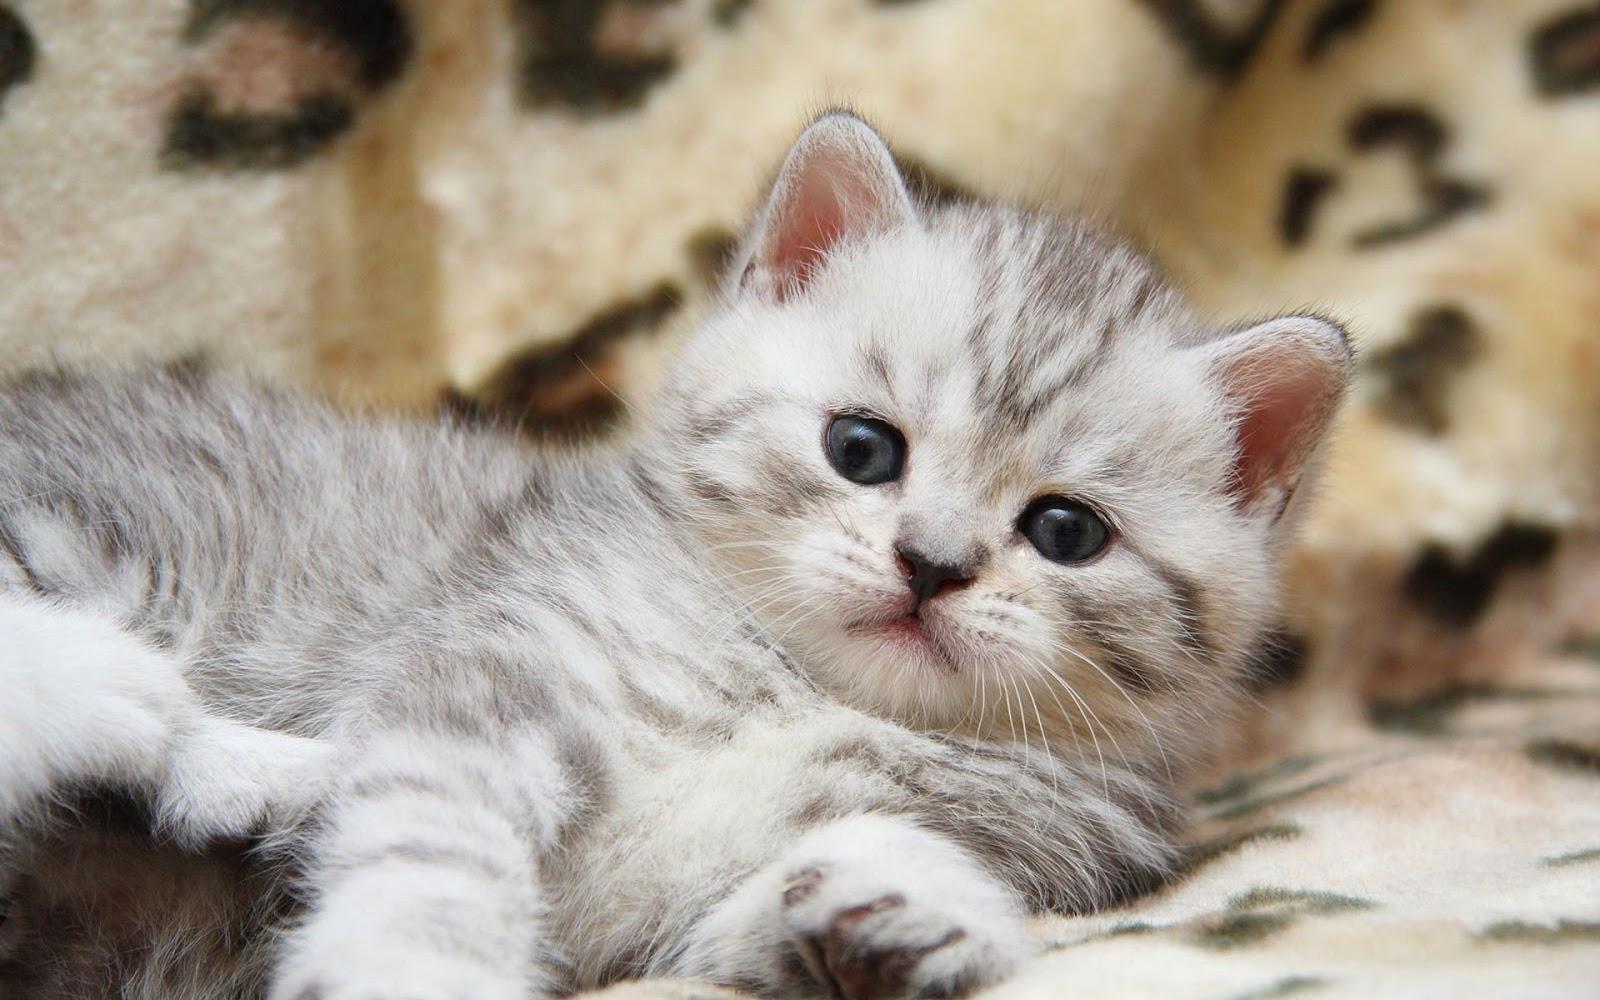 Muhammad nouman ali sheroz awais iqbal talha mohsin riaz cute cats wallpapers beautiful cats - Caterpillar wallpaper ...